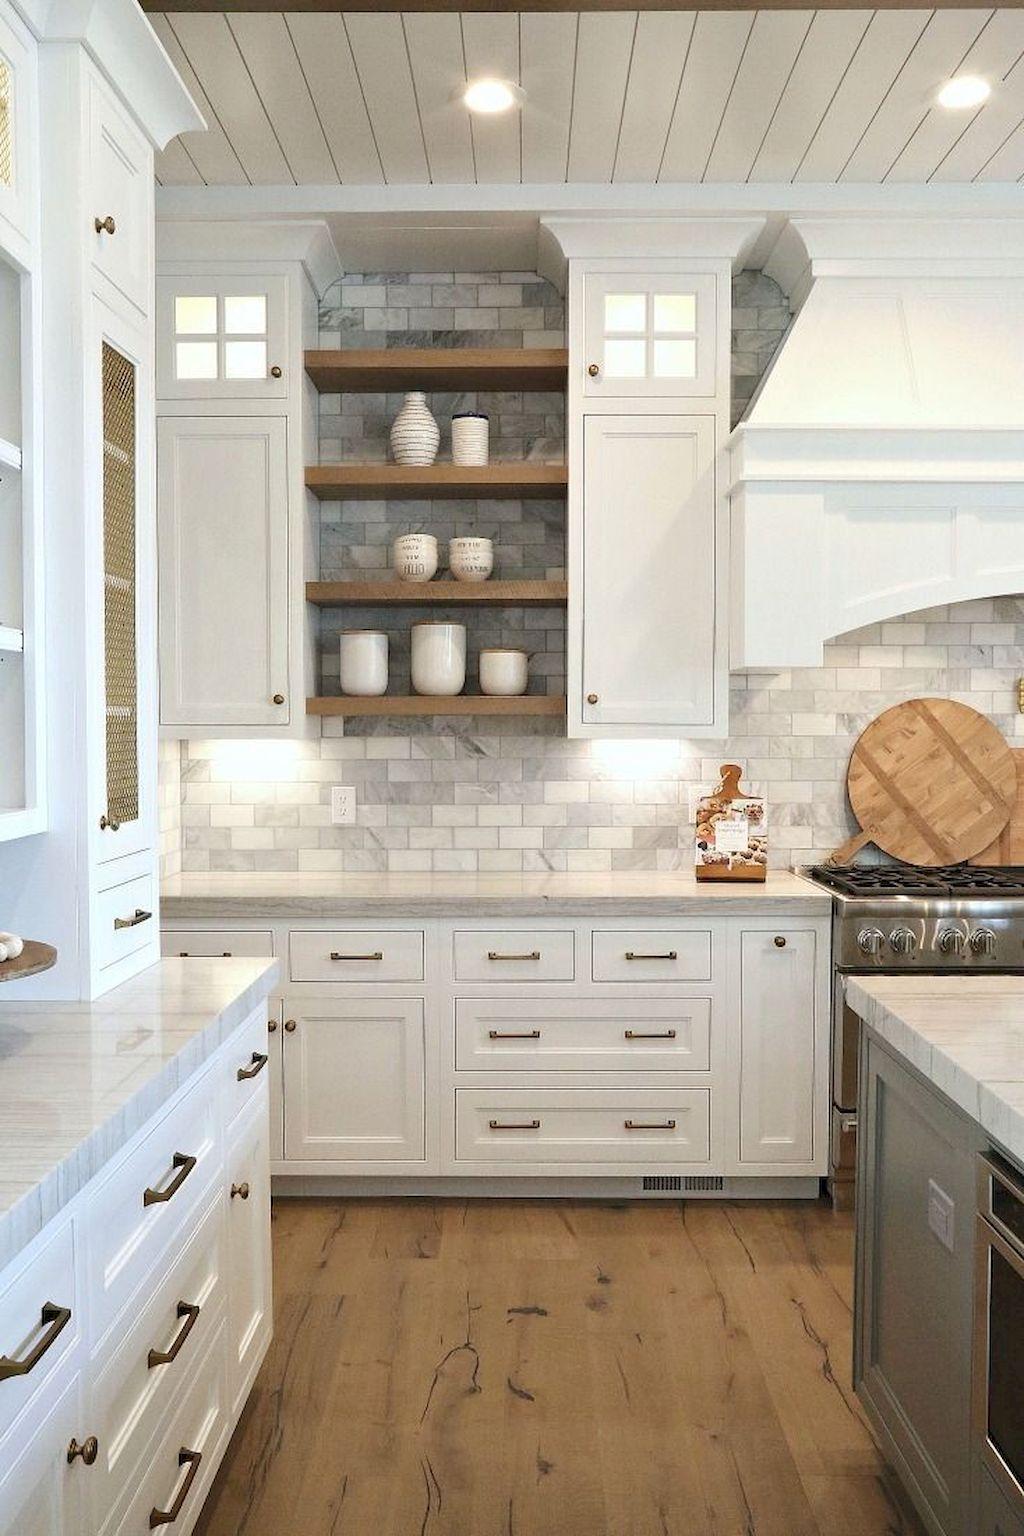 Pin By Avery Birch On House Kitchens Kitchen Cabinets Decor Rustic Farmhouse Kitchen Farmhouse Kitchen Backsplash